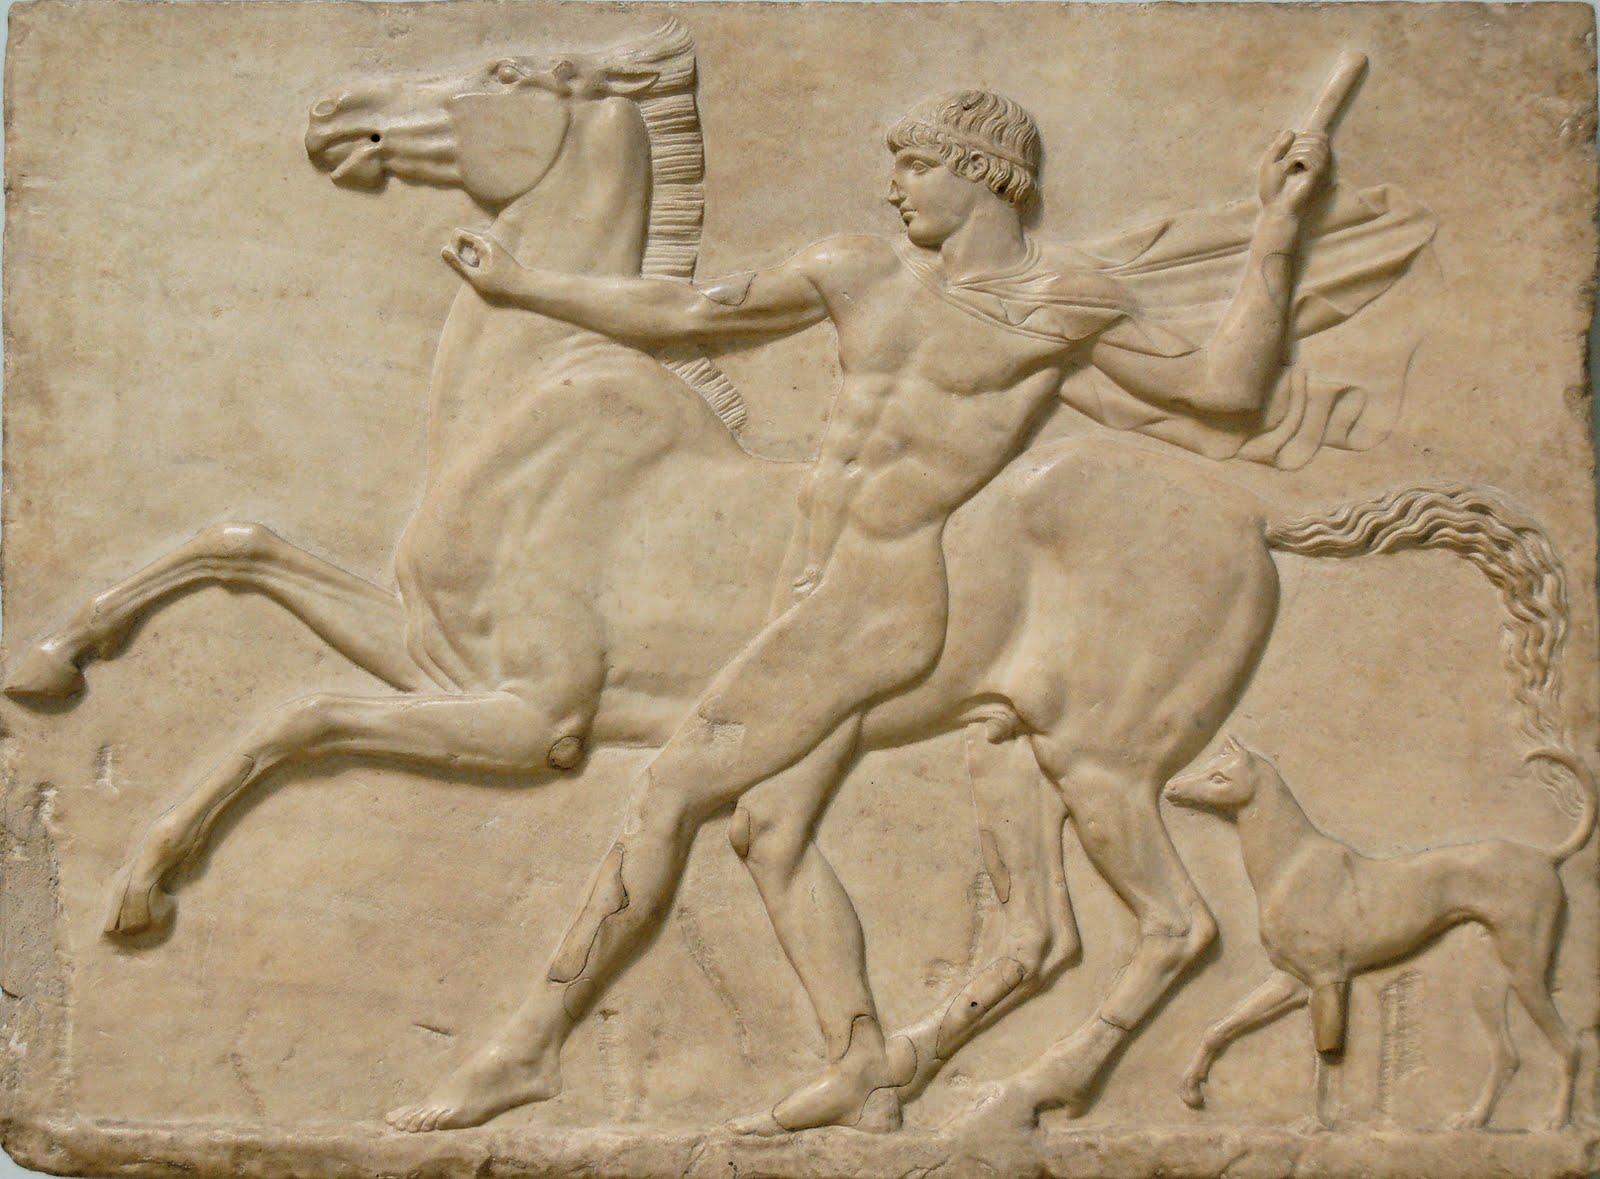 Xenophon-On horsemanship sp